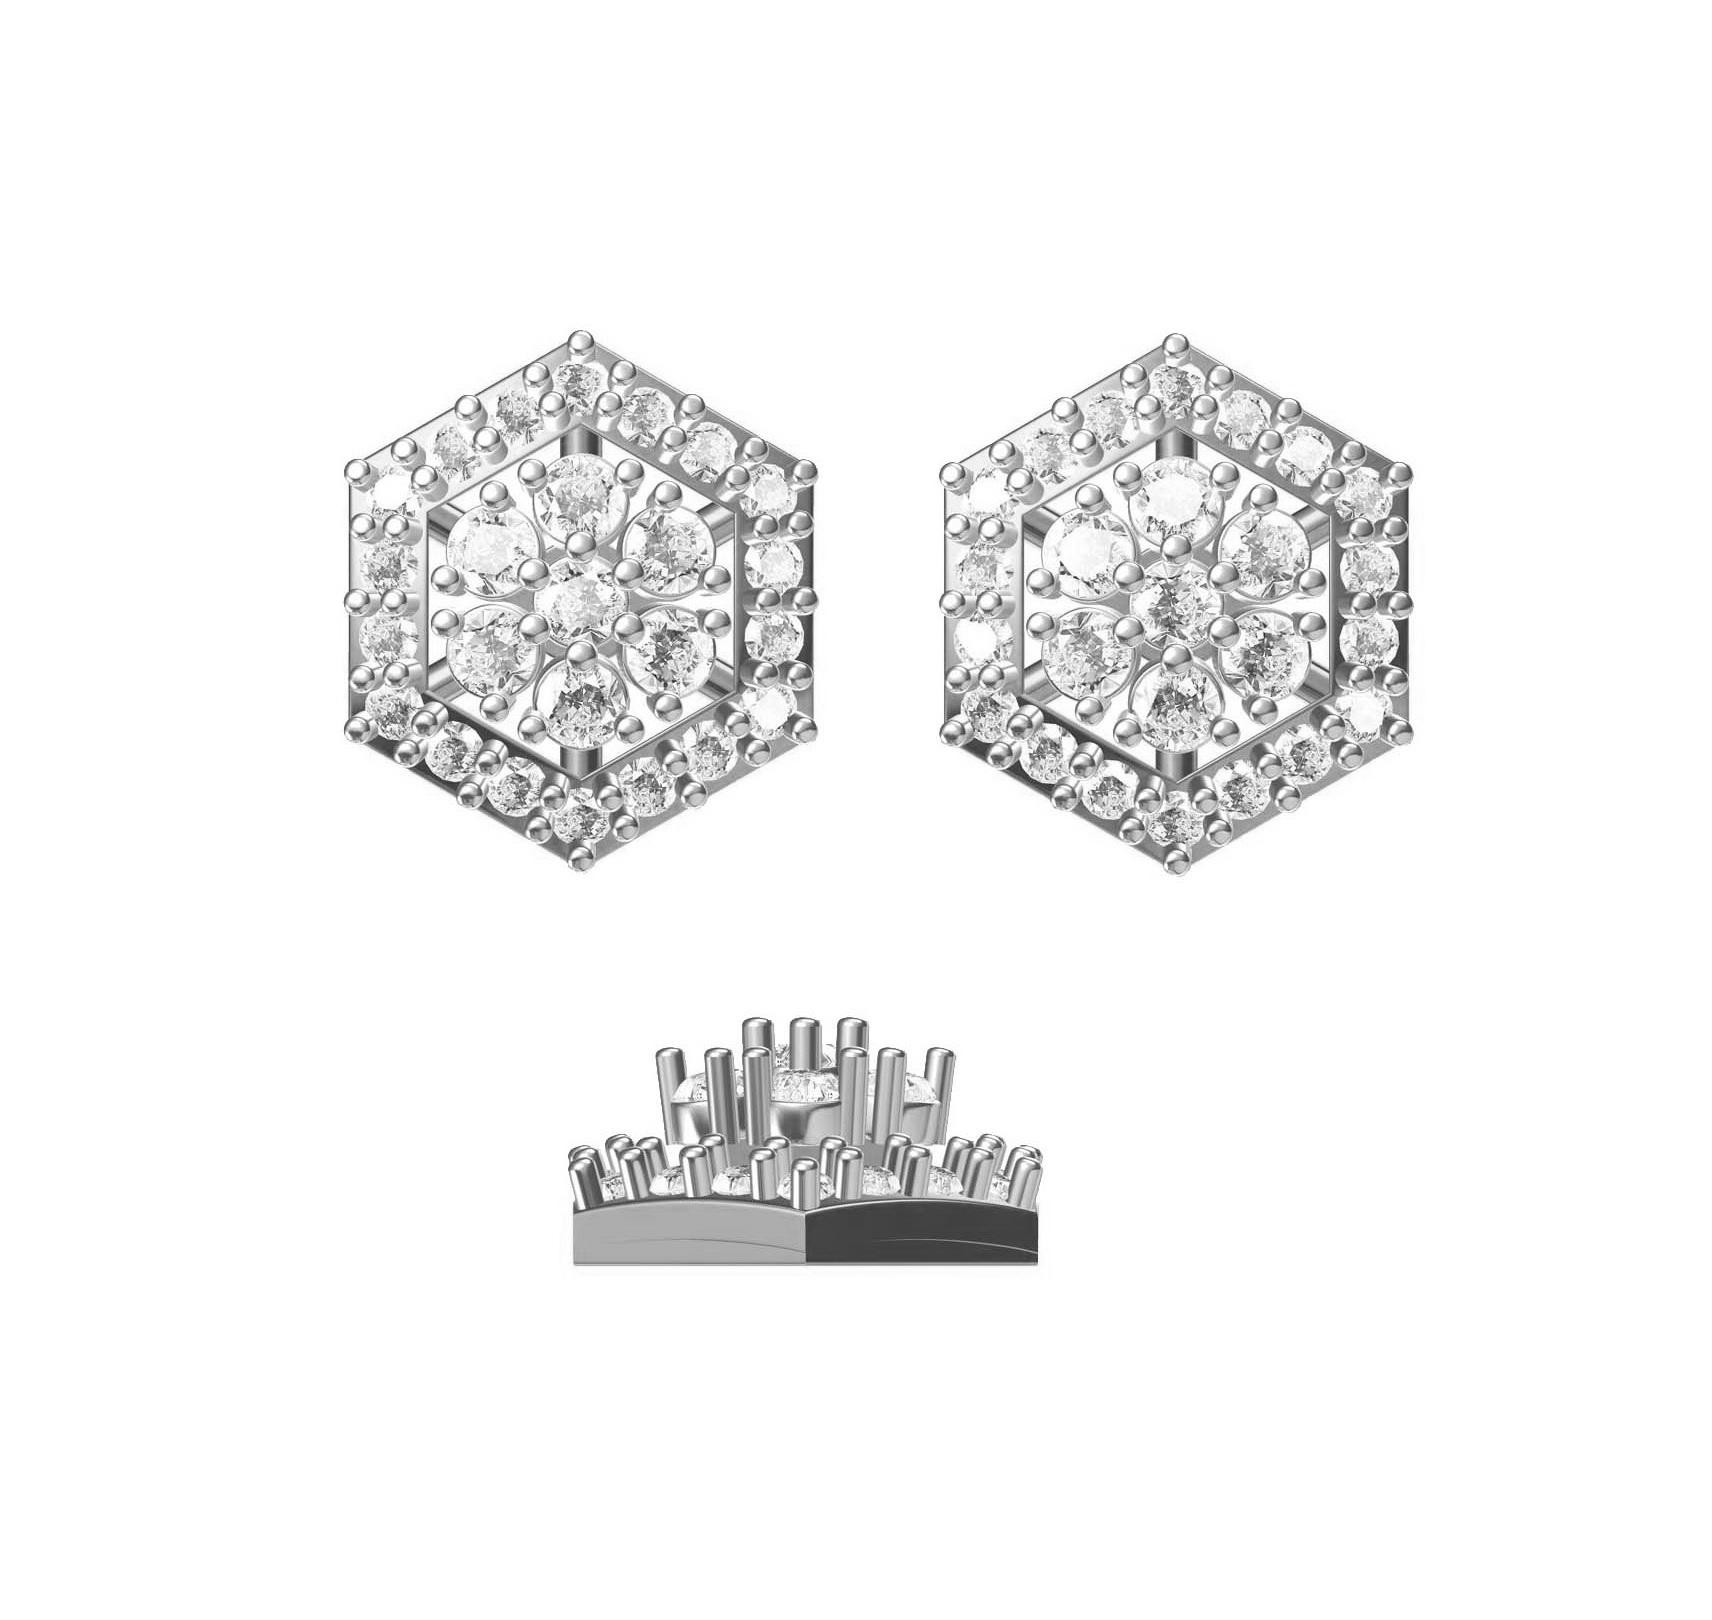 Diamond Earring TCW 0.596 14K gold 1.9 gm